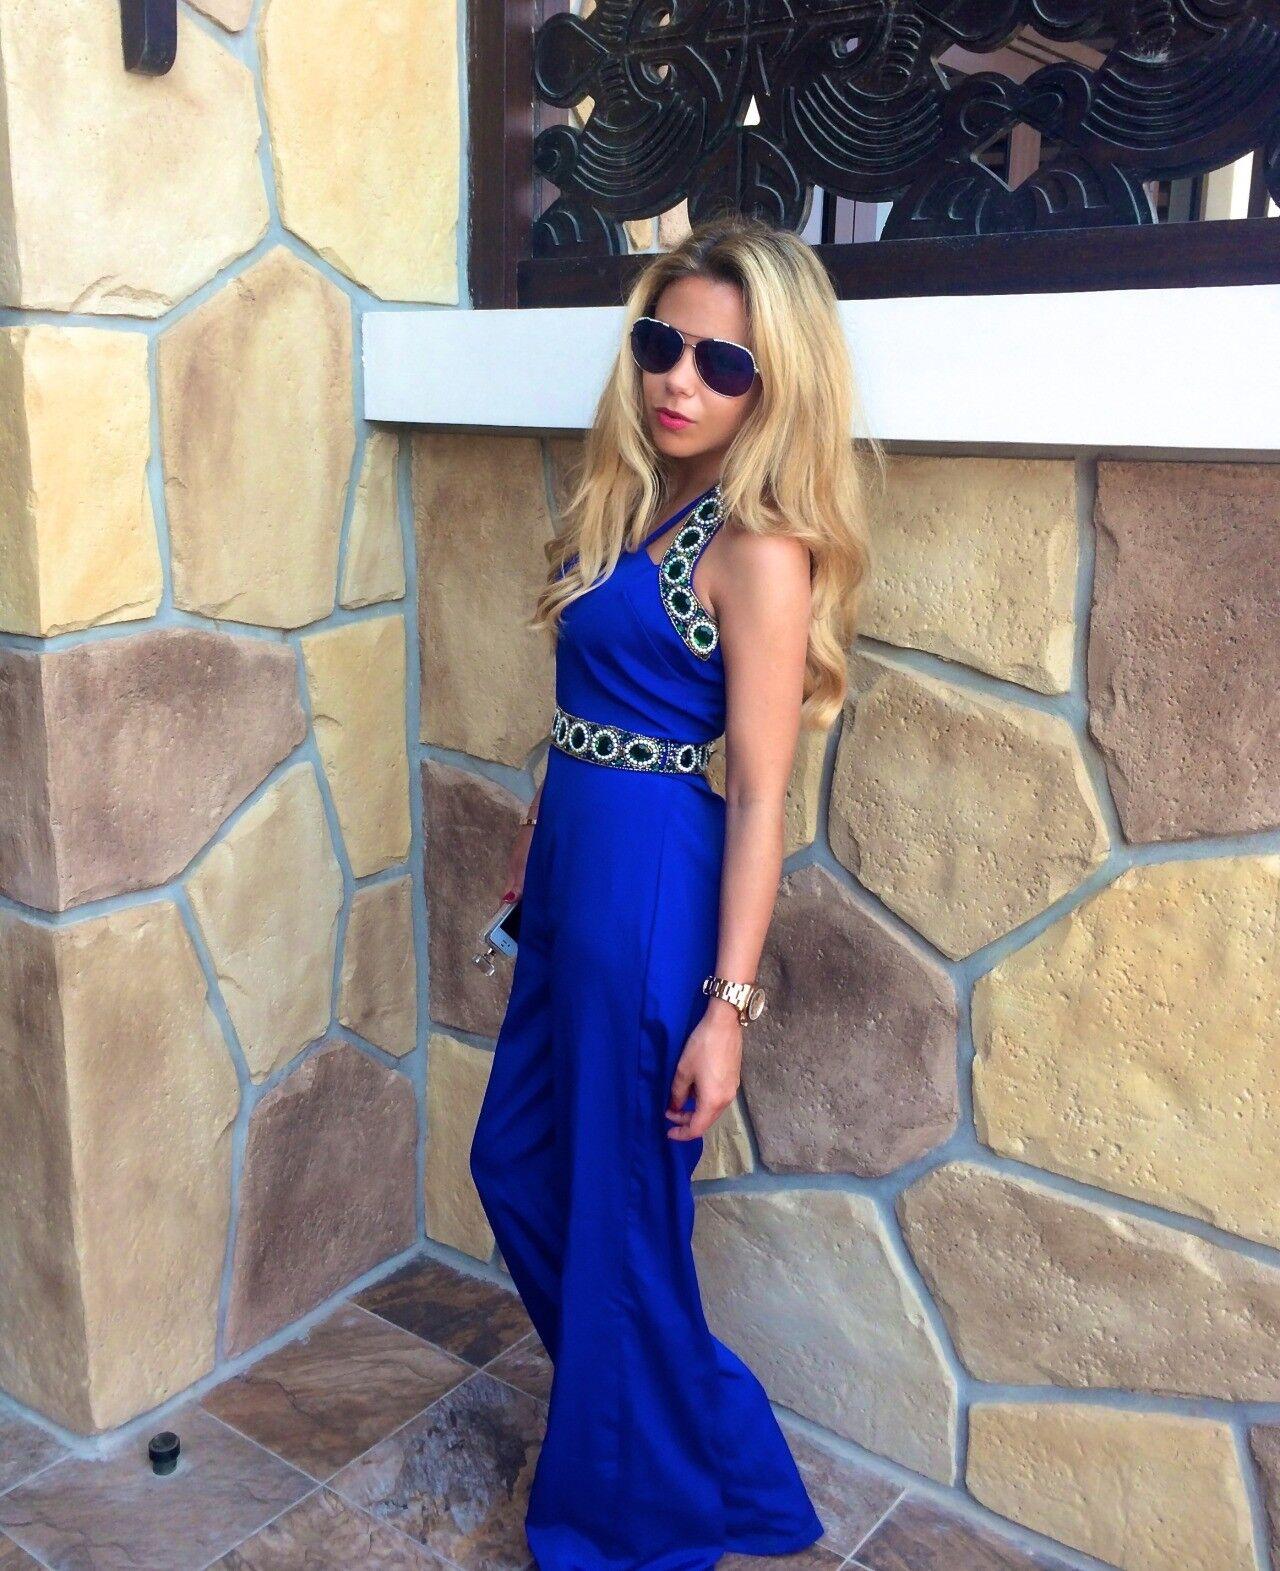 Virgos Lounge bluee Embellished Jumpsuit Dress Wedding Cruise Occasion Party 10